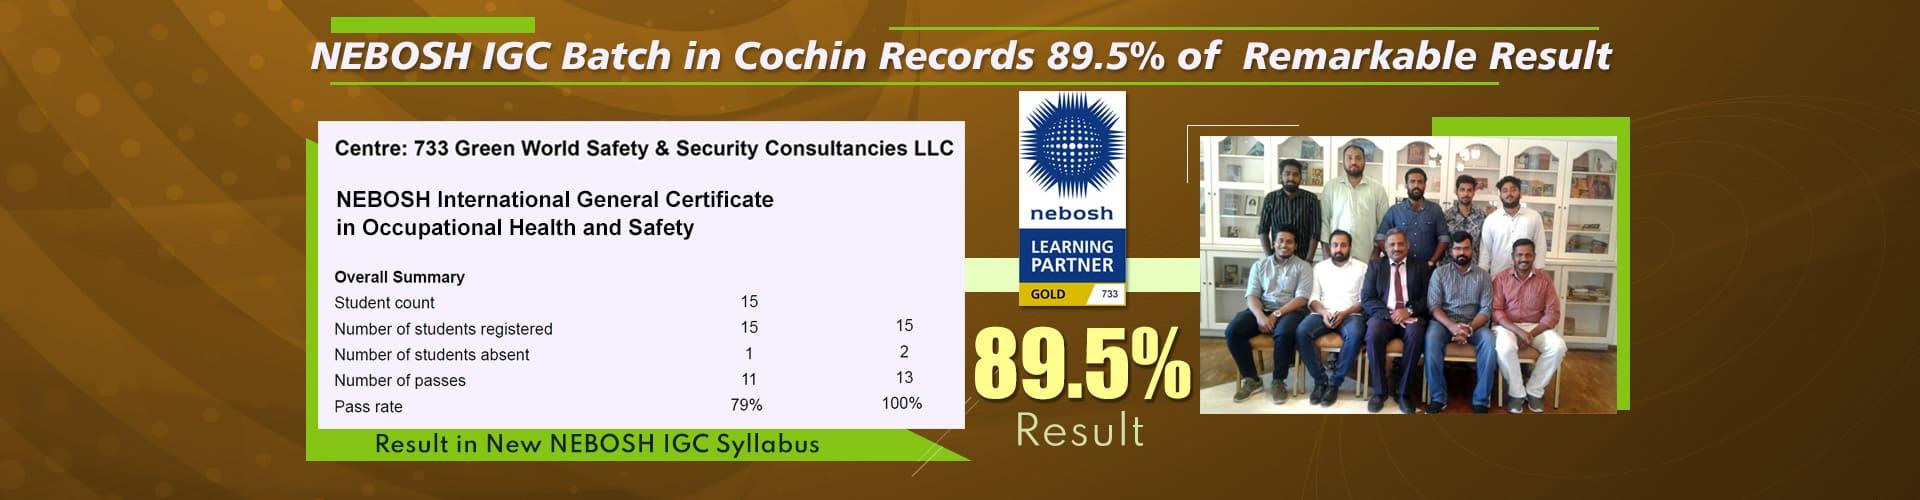 NEBOSH_IGC_Cochin_Result_Banner_coin_Apr